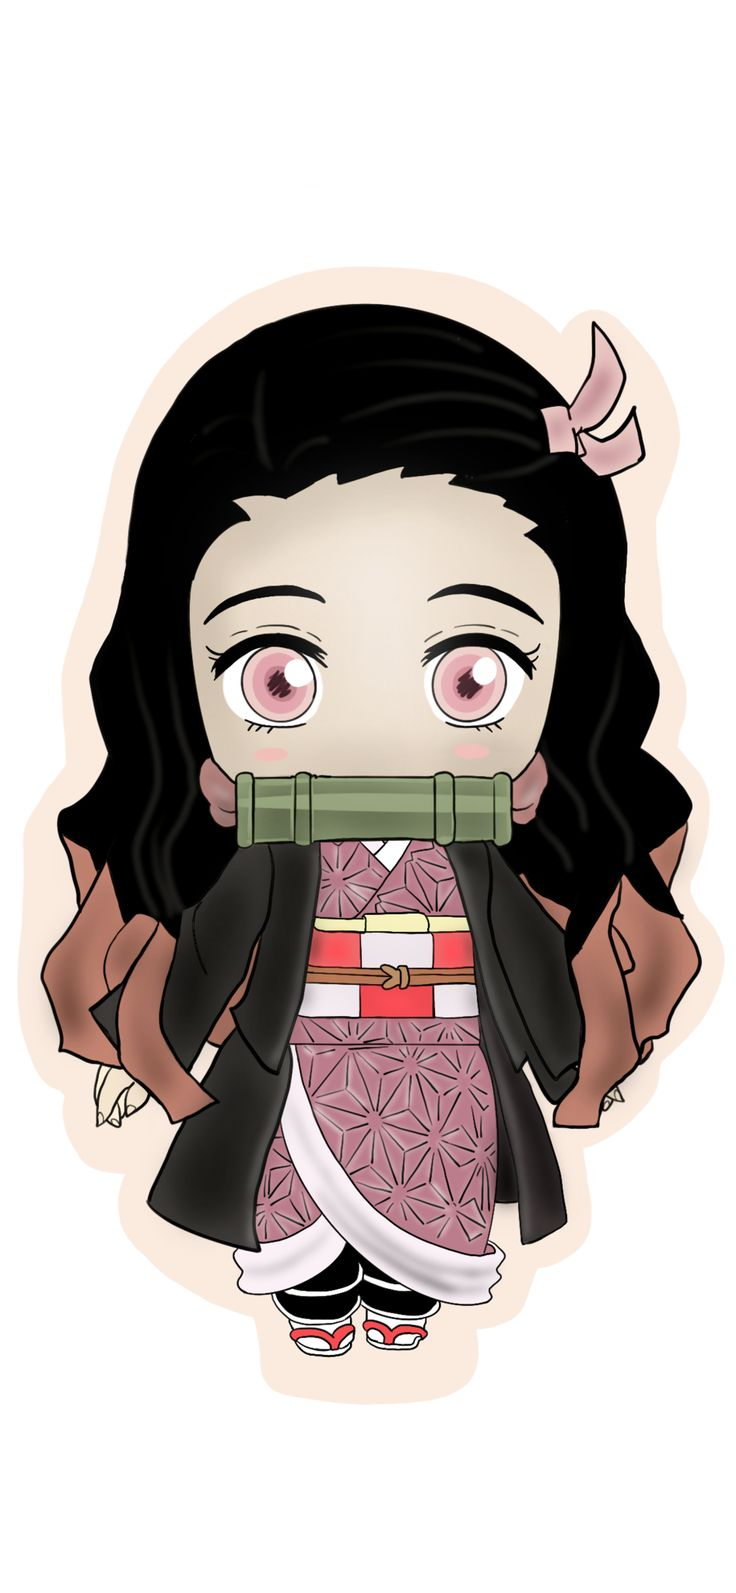 Fanarts Anime, Anime Chibi, Anime Naruto, Kawaii Anime, Anime Characters, All Anime, Anime Girl Cute, Anime Art Girl, Funny Disney Jokes